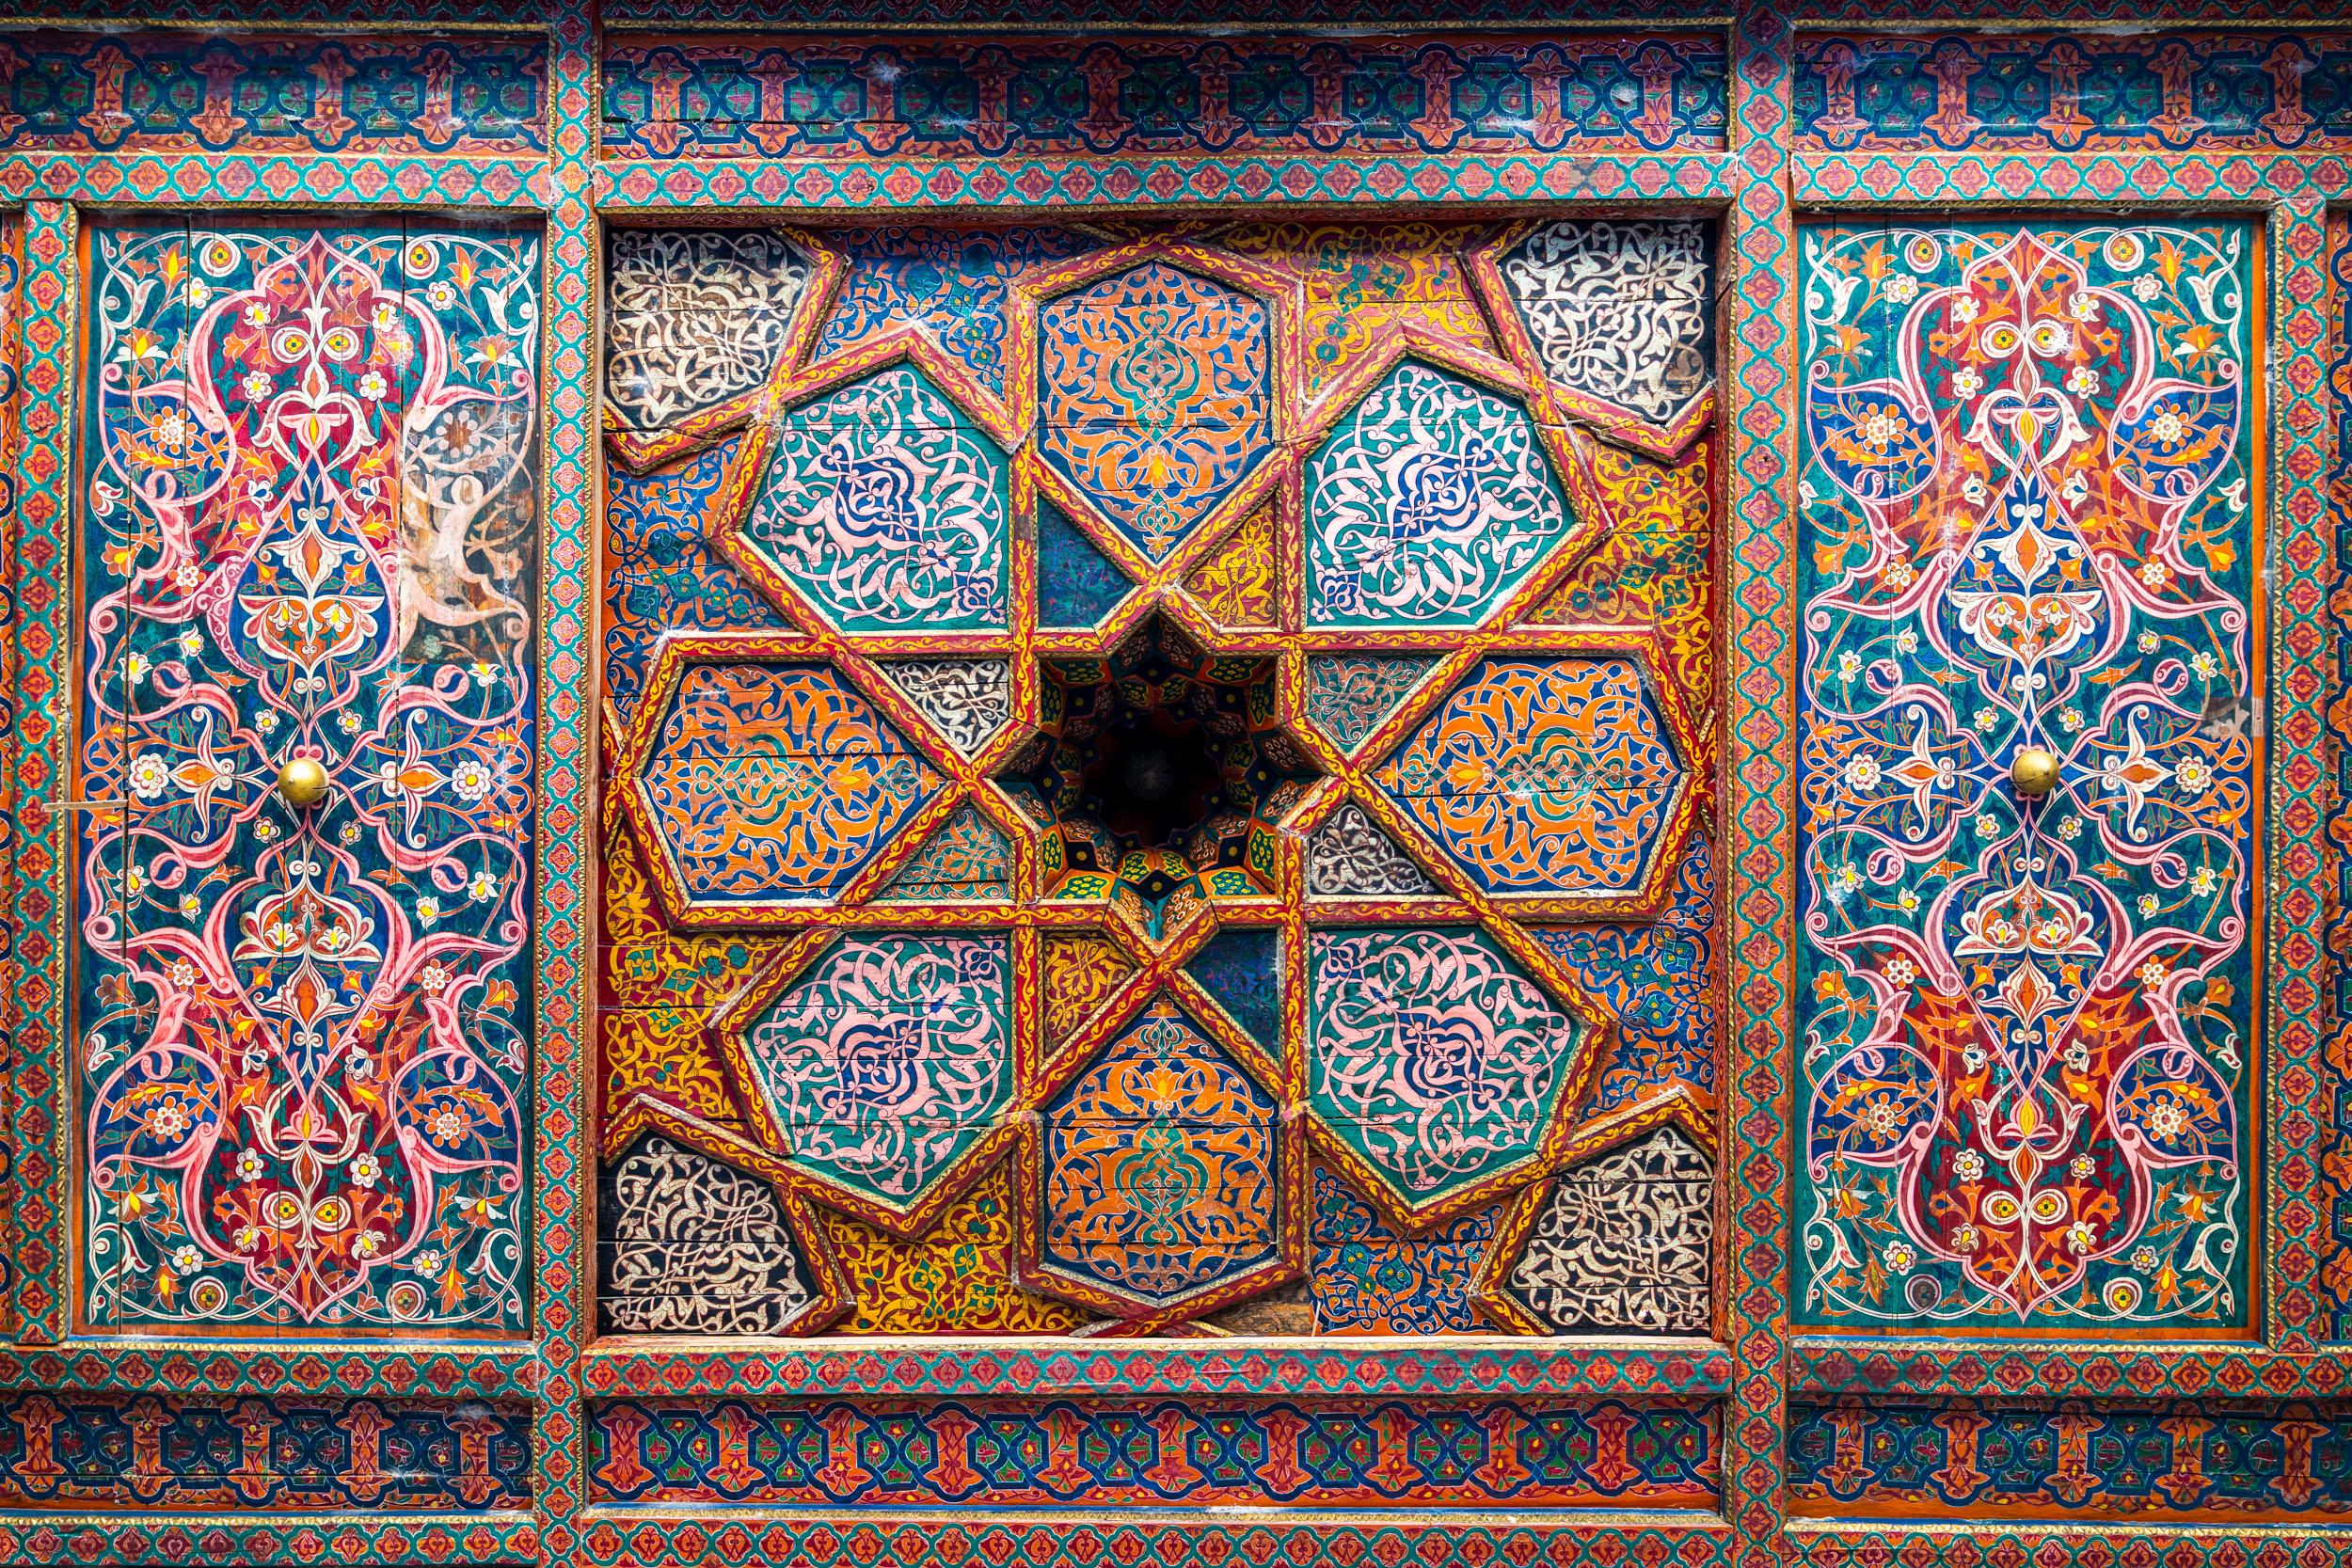 Ceilings detail from Khiva's Tash Hauli Palace.